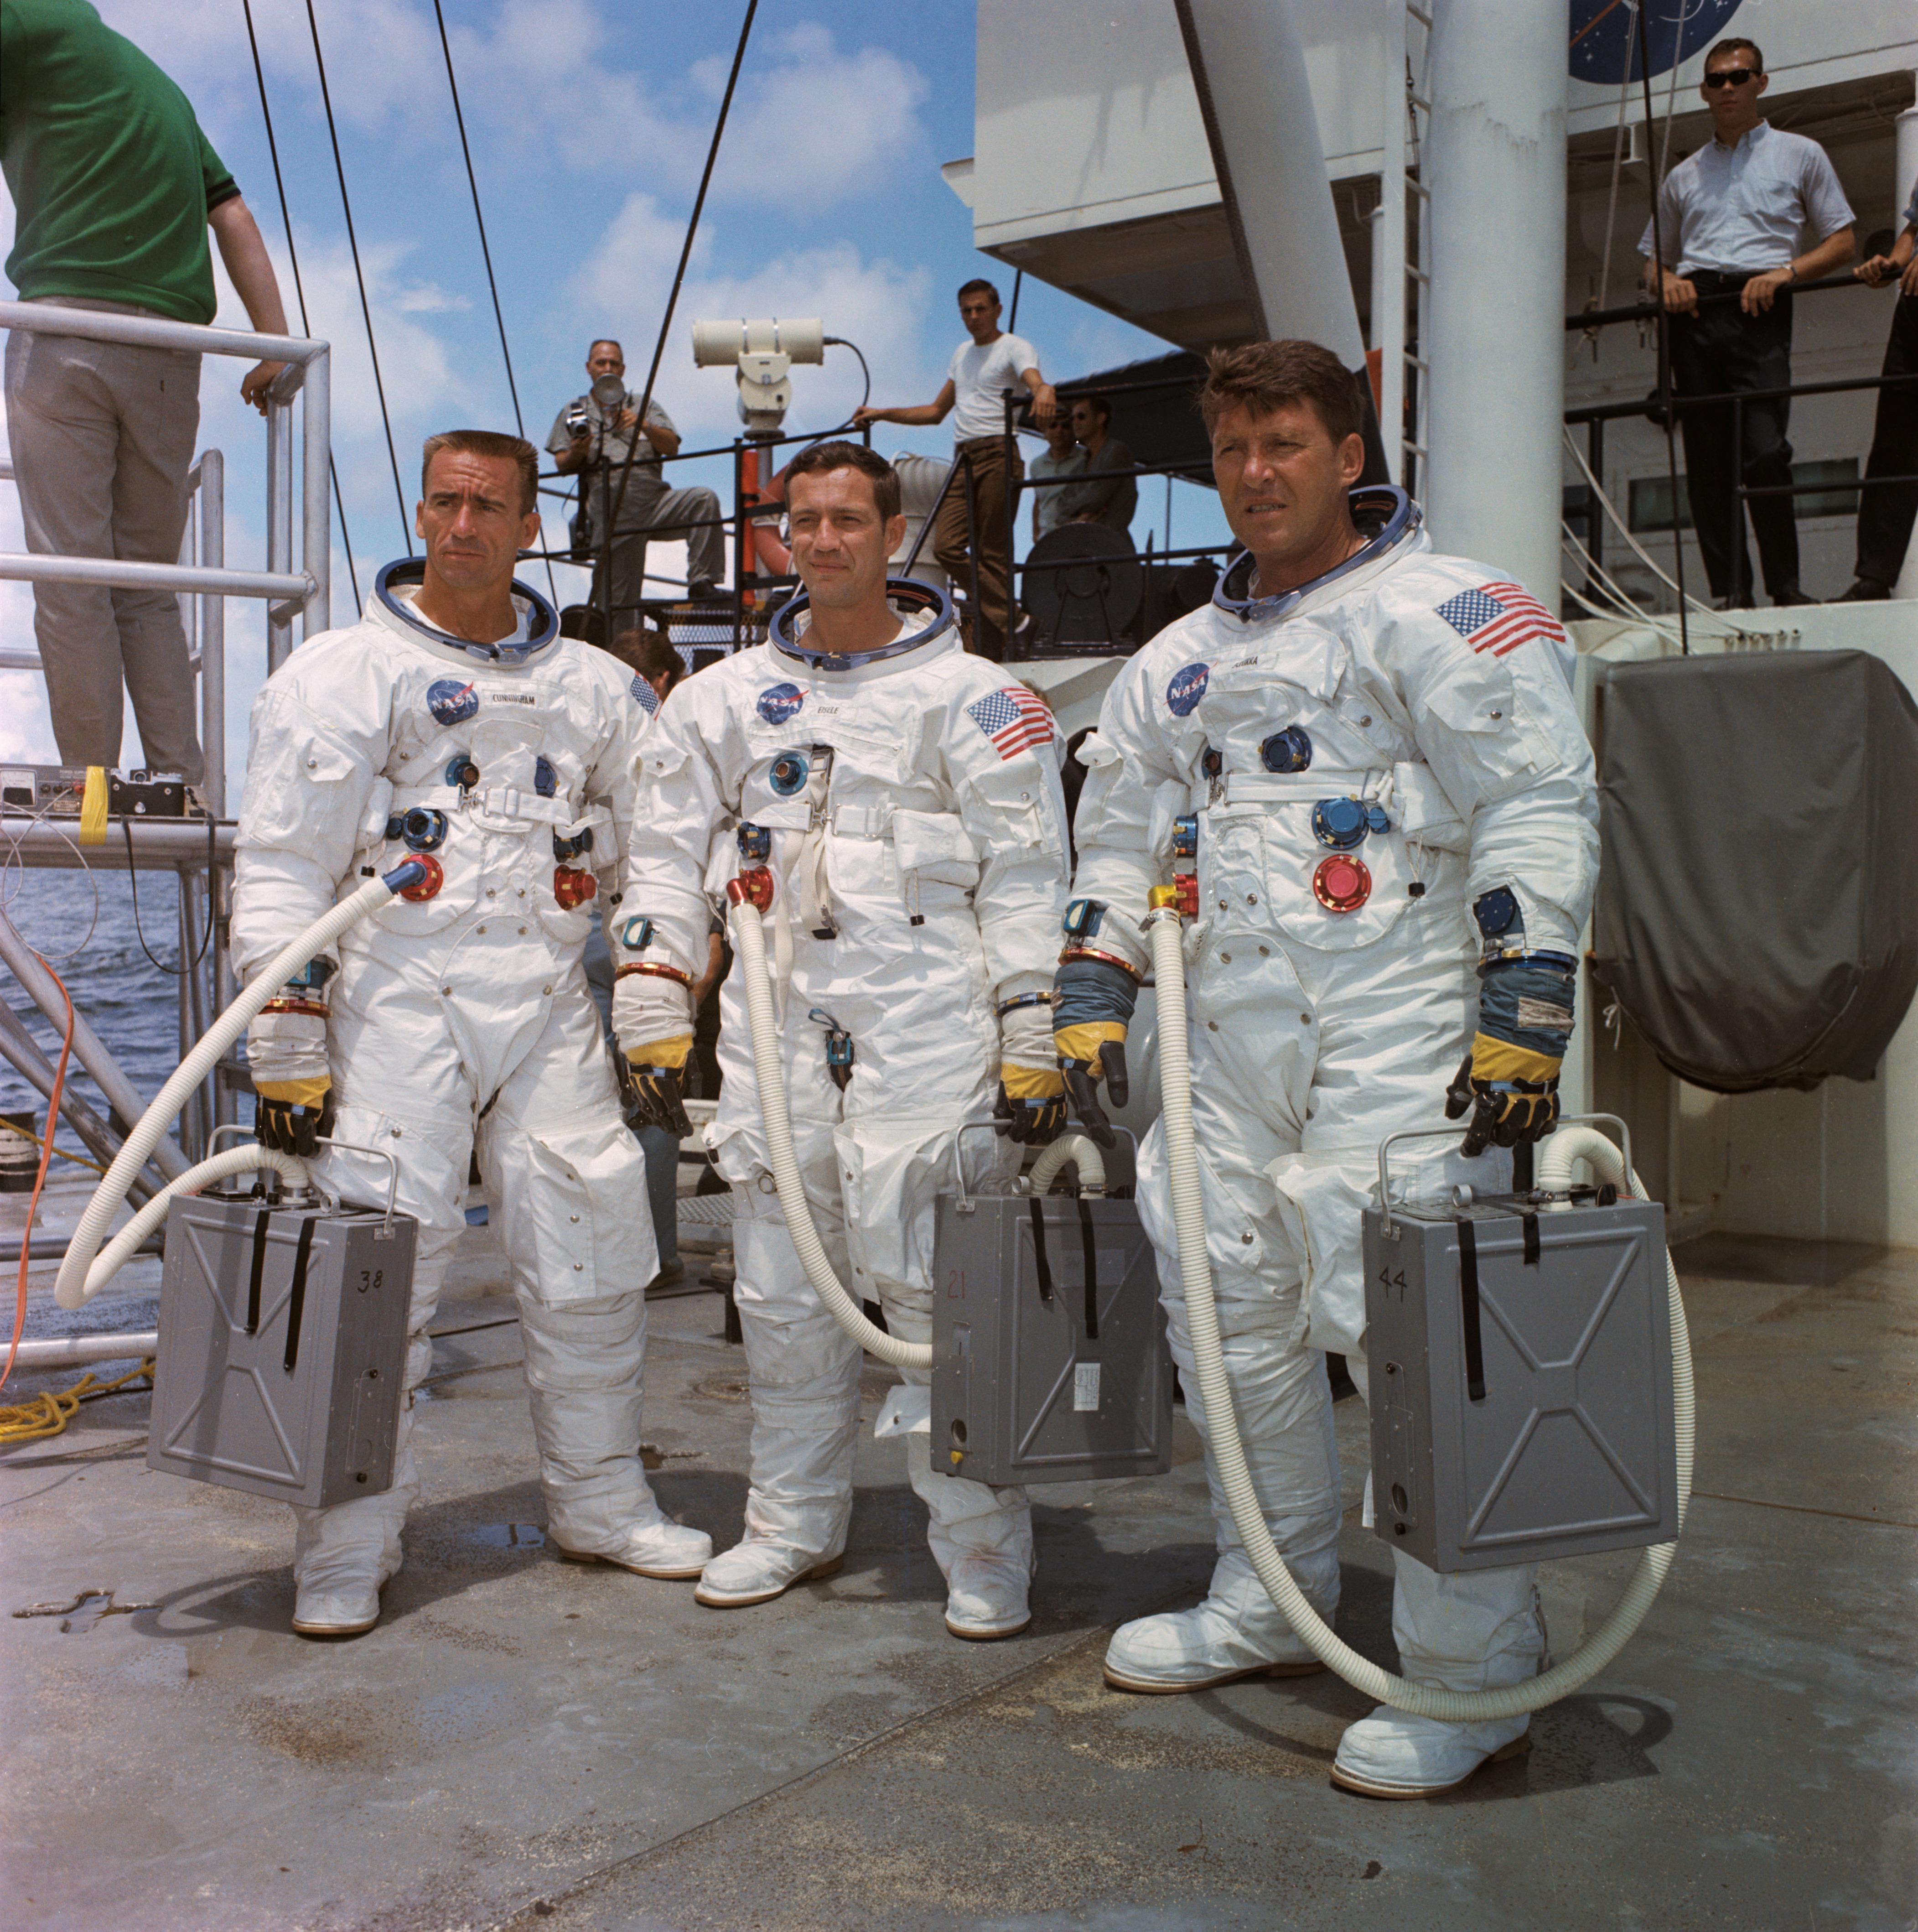 apollo 7 space suits - photo #6